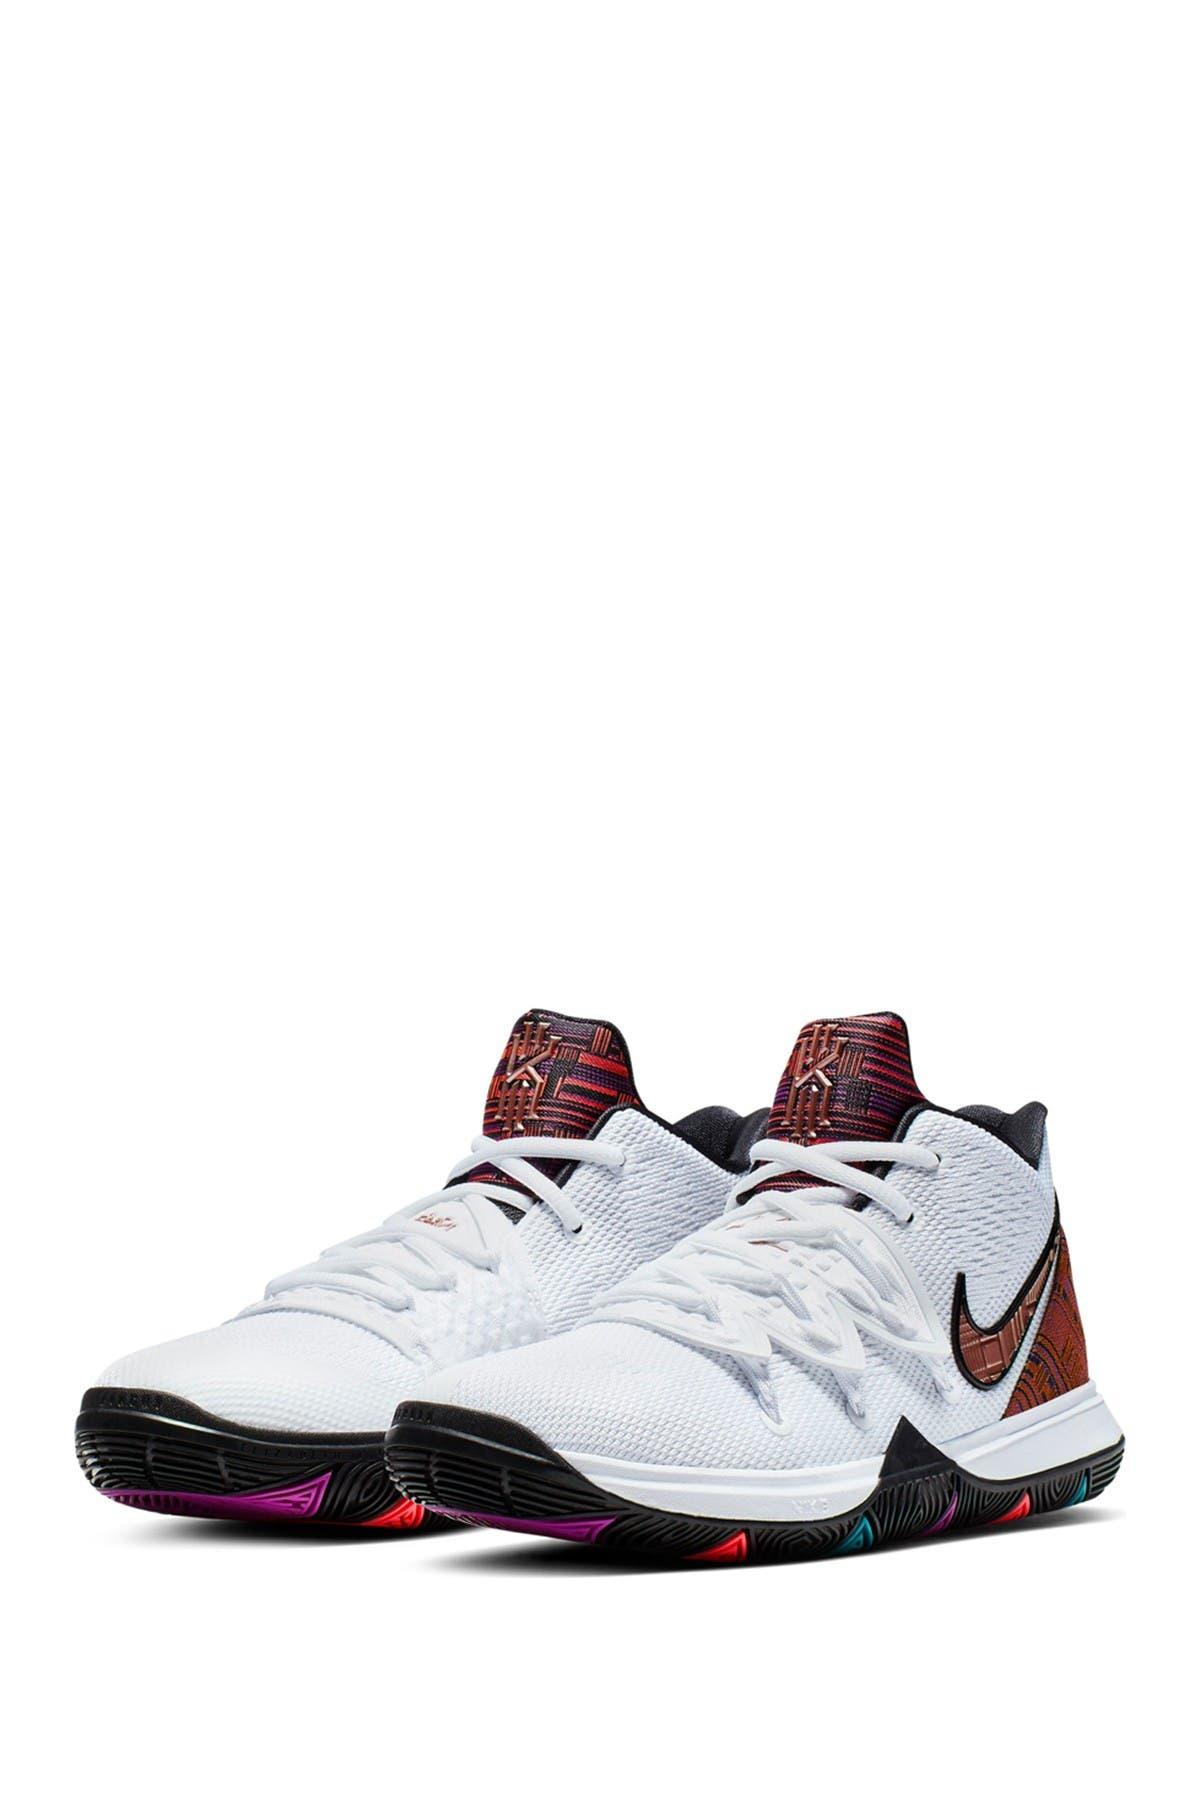 Nike | Kyrie 5 BHM GS Basketball